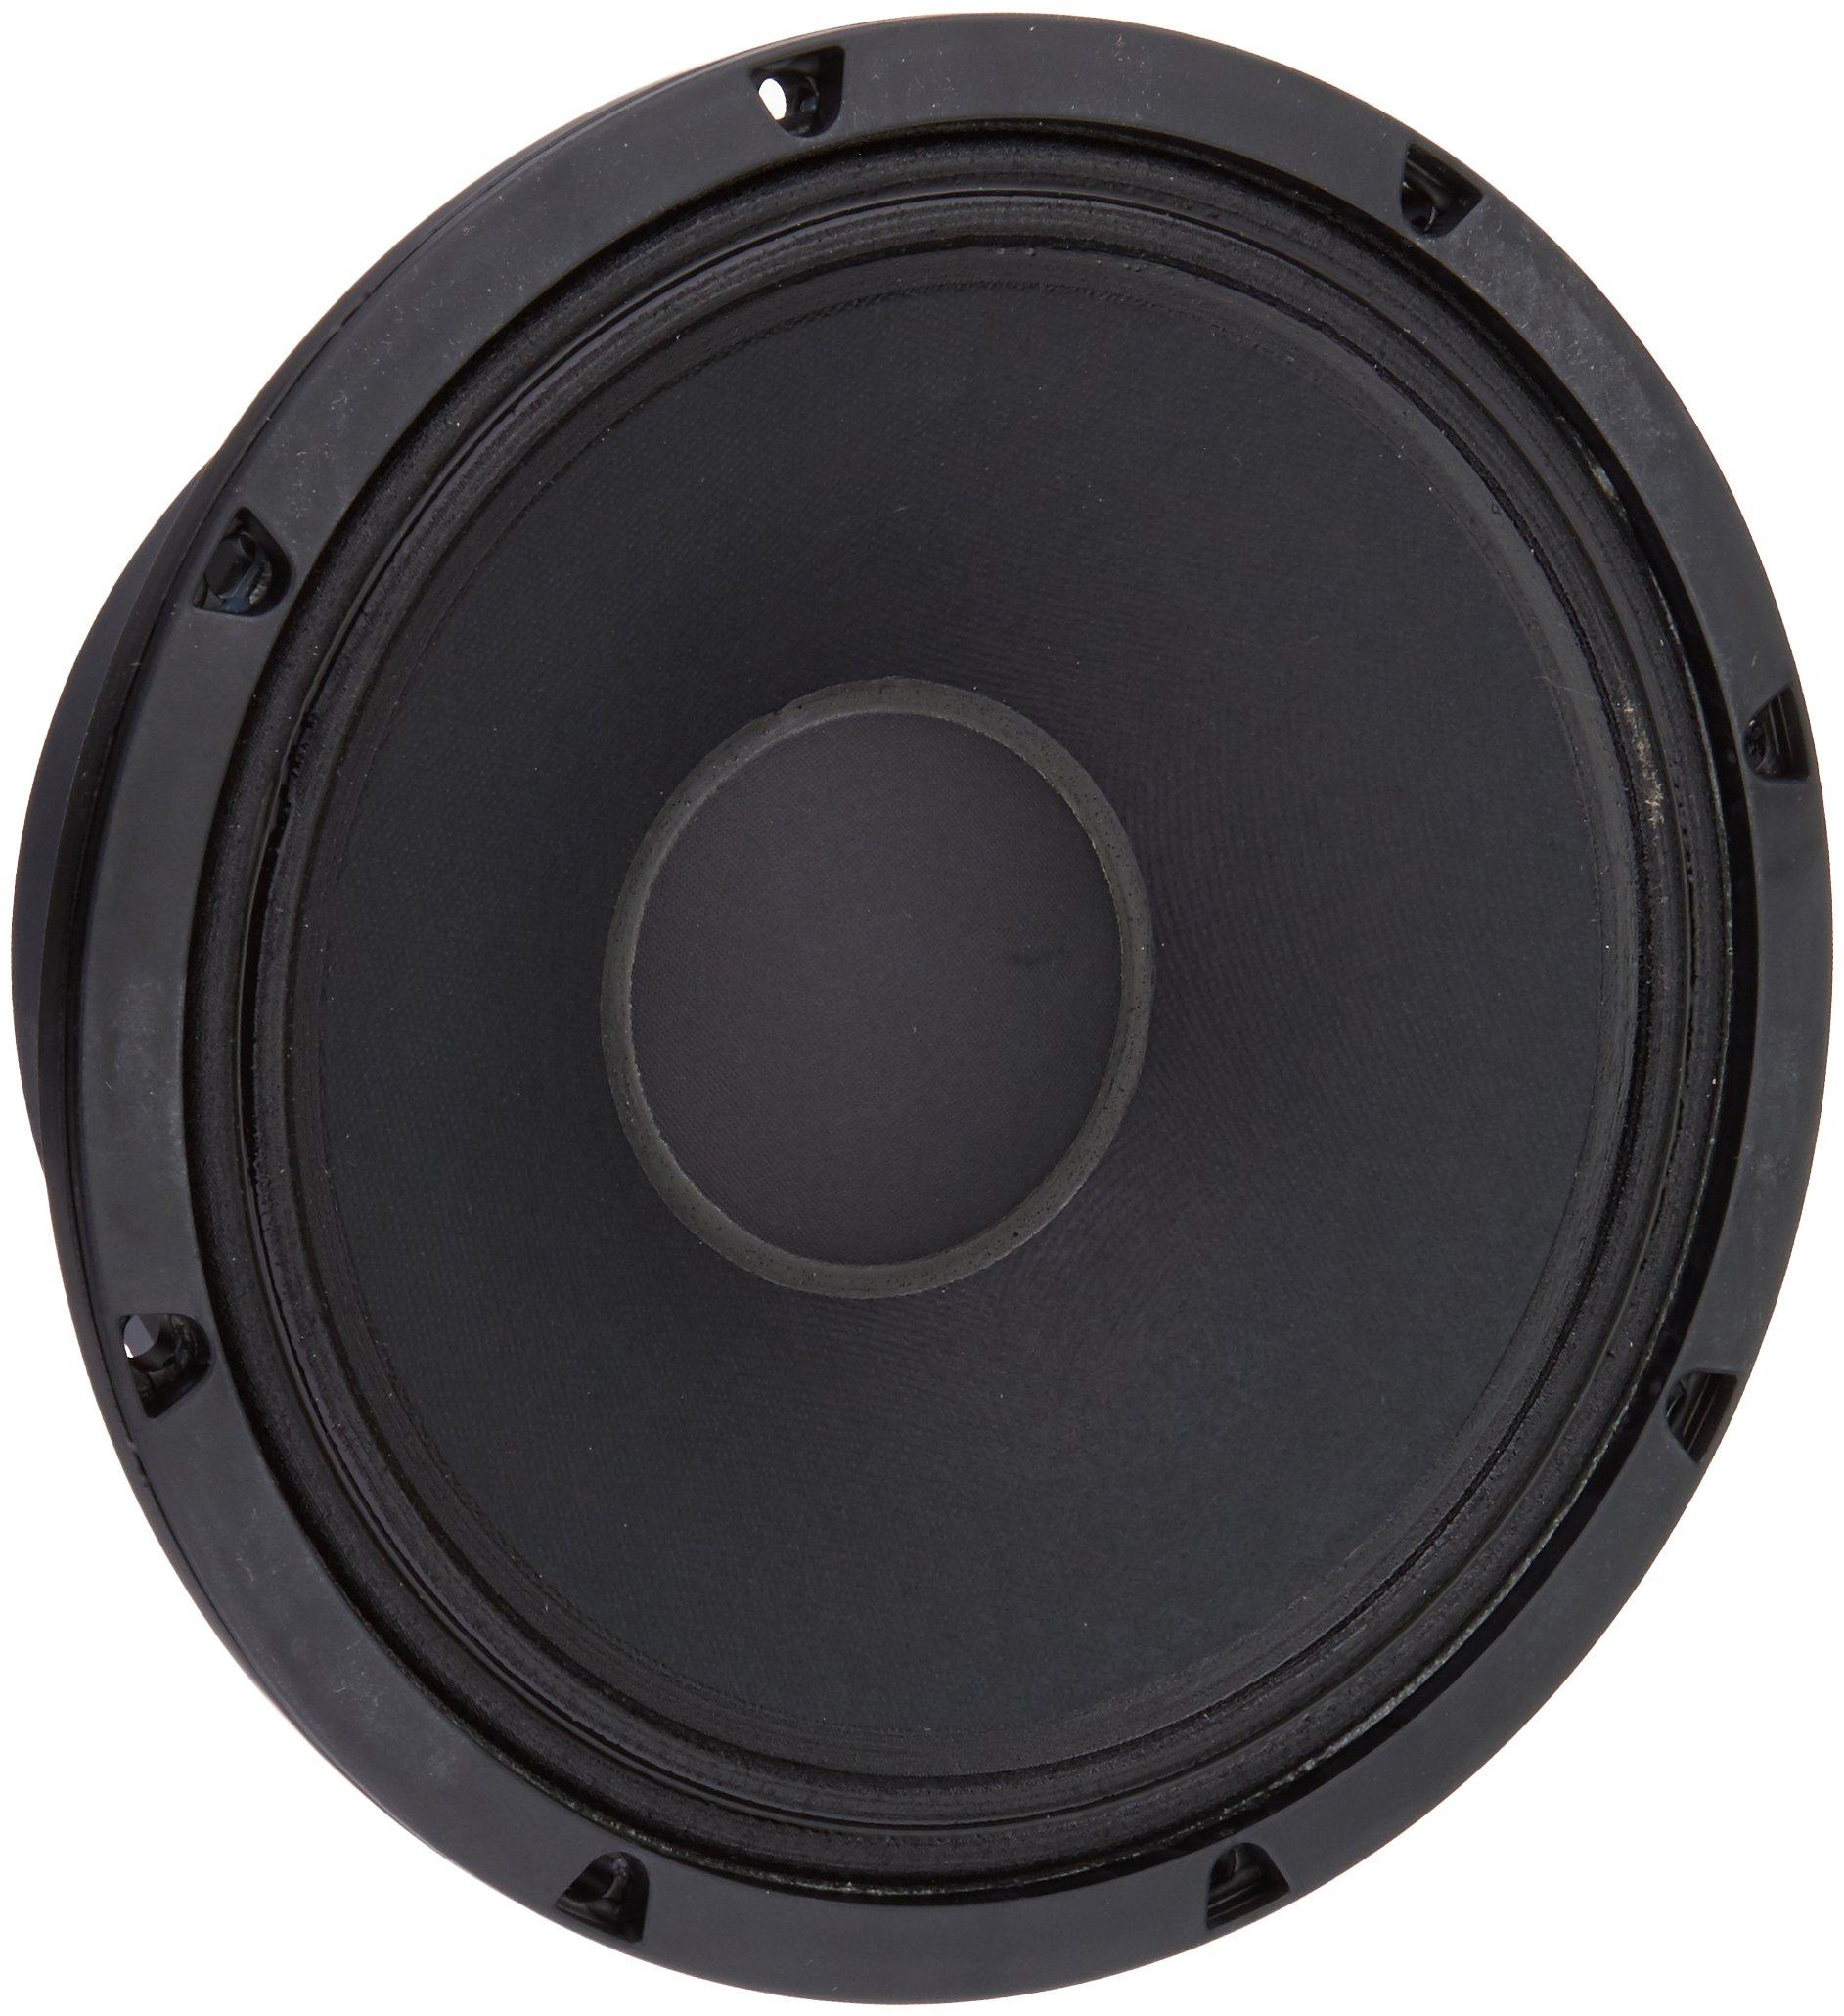 18 Sound 10MB600 Mid-Bass Speaker